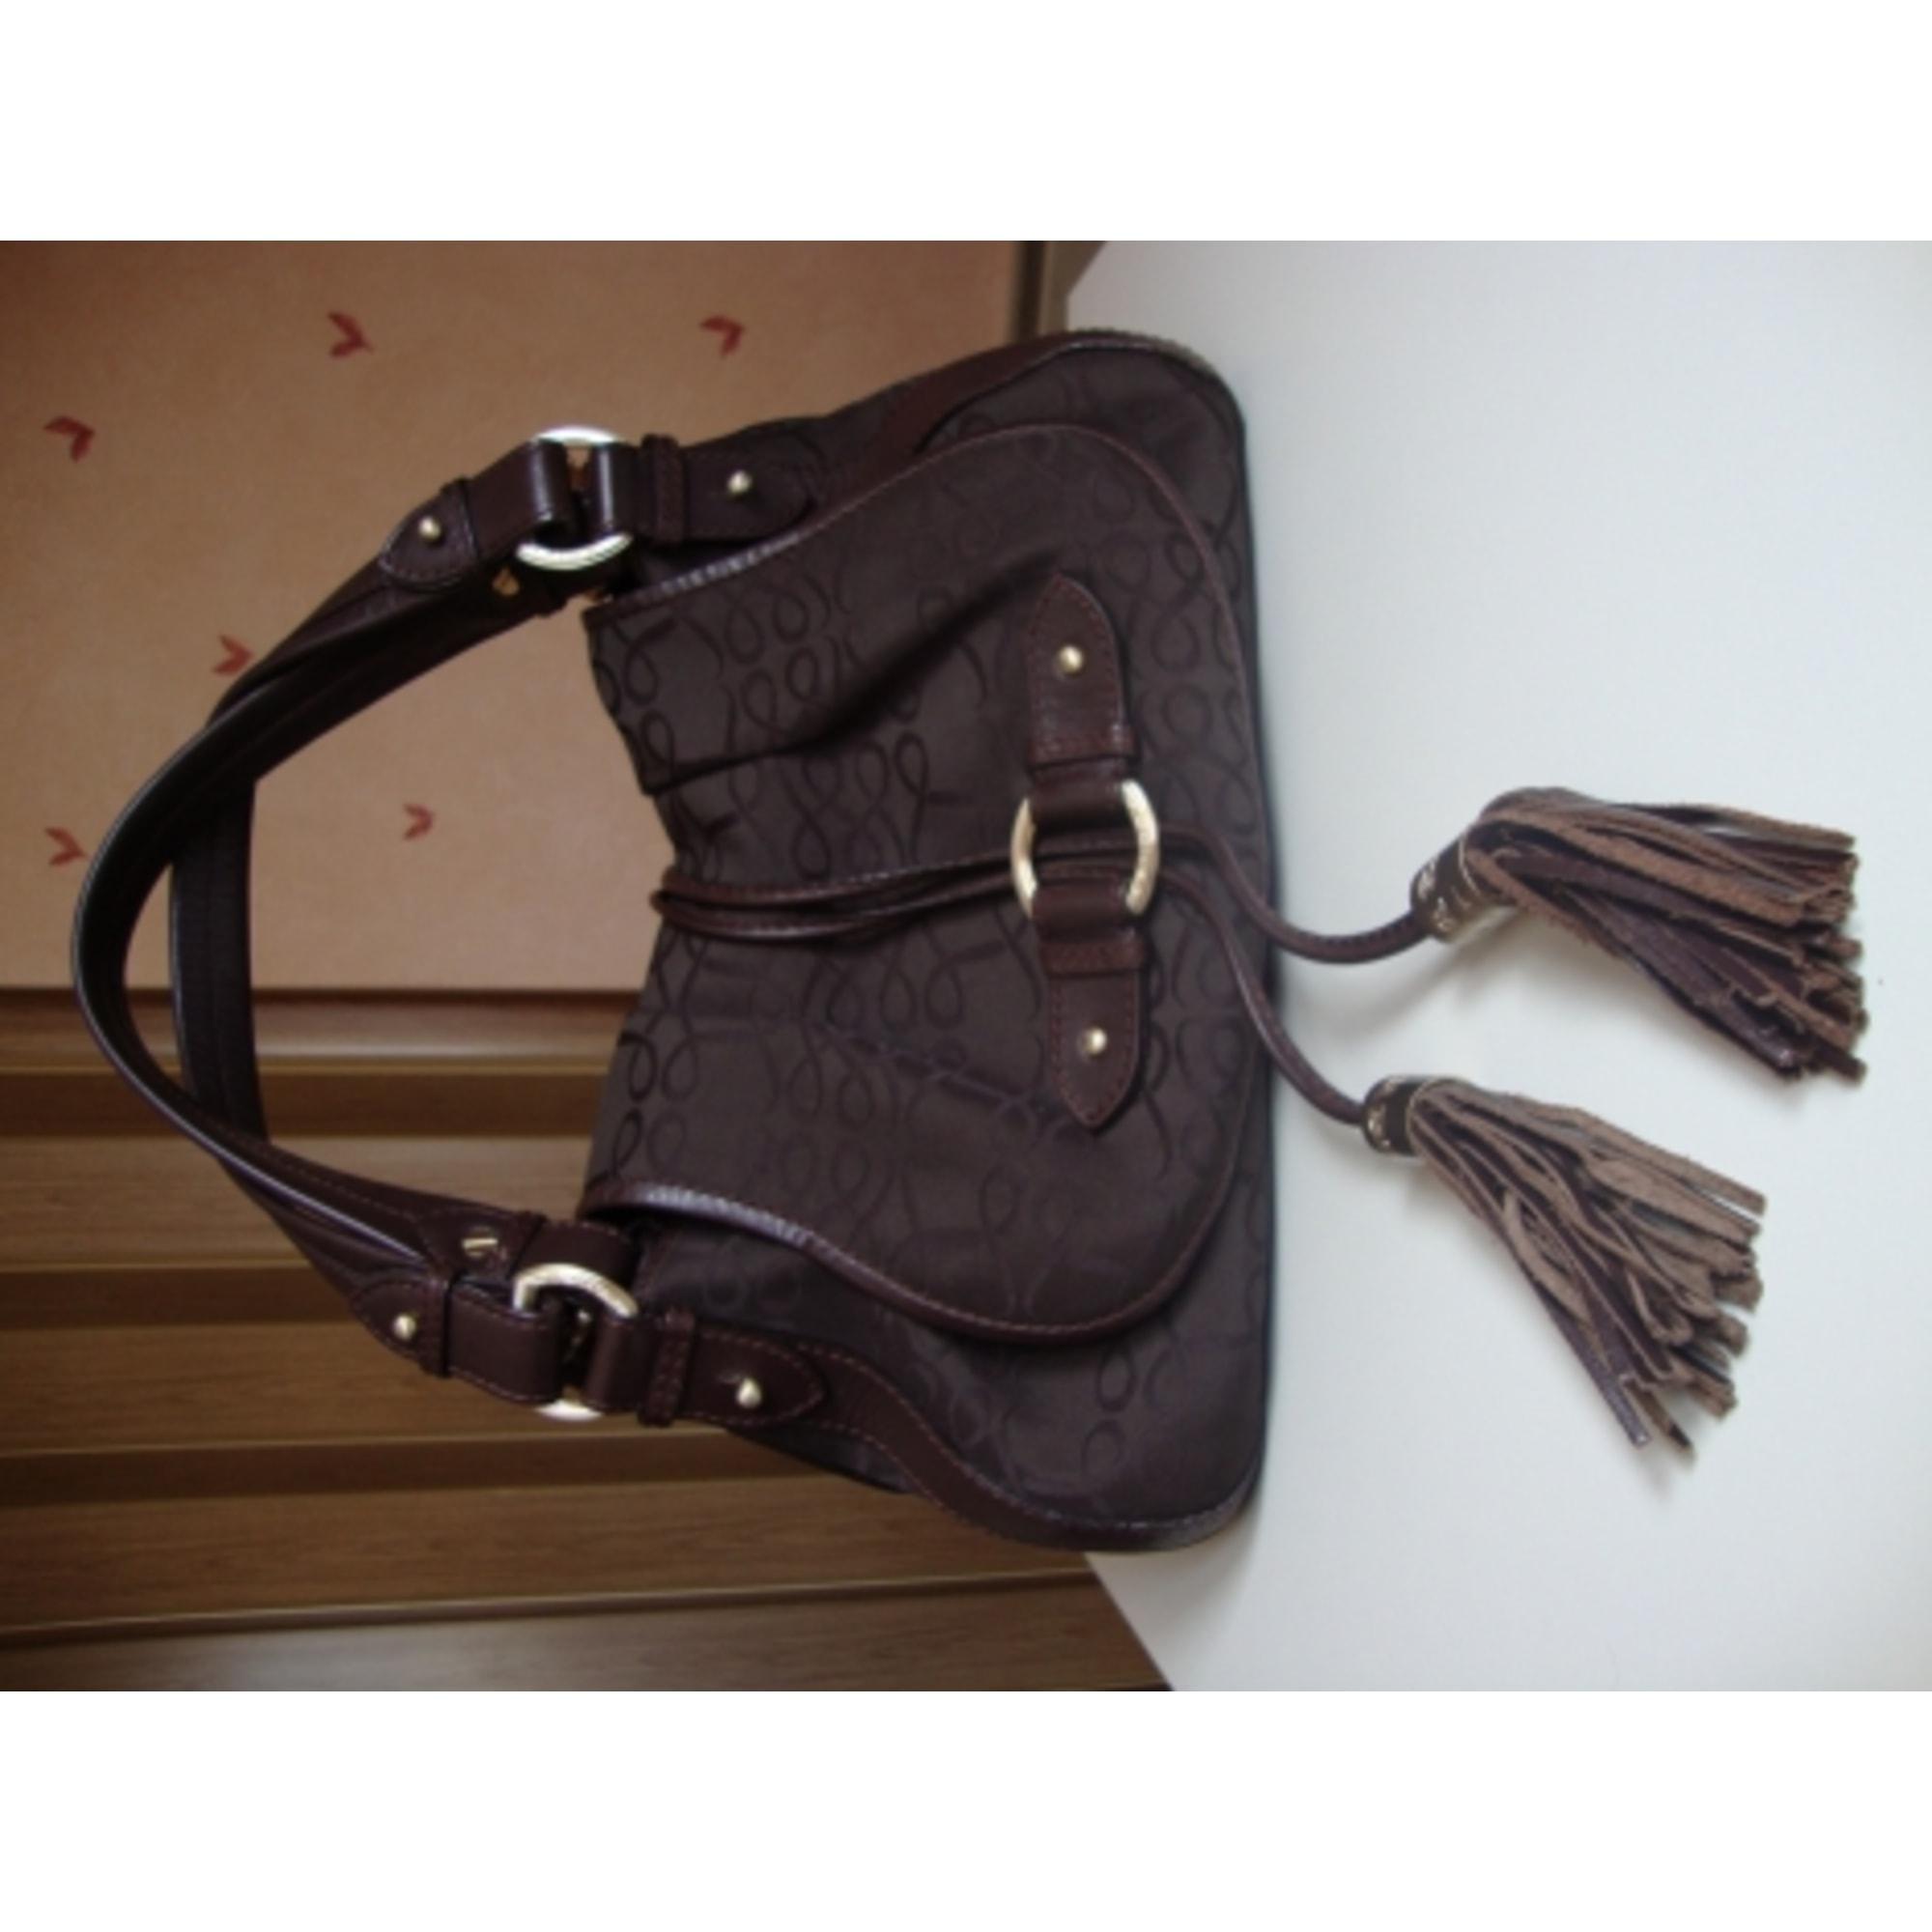 a459fcee81 Sac à main en cuir LANCEL marron vendu par Dora 52279190 - 1321637